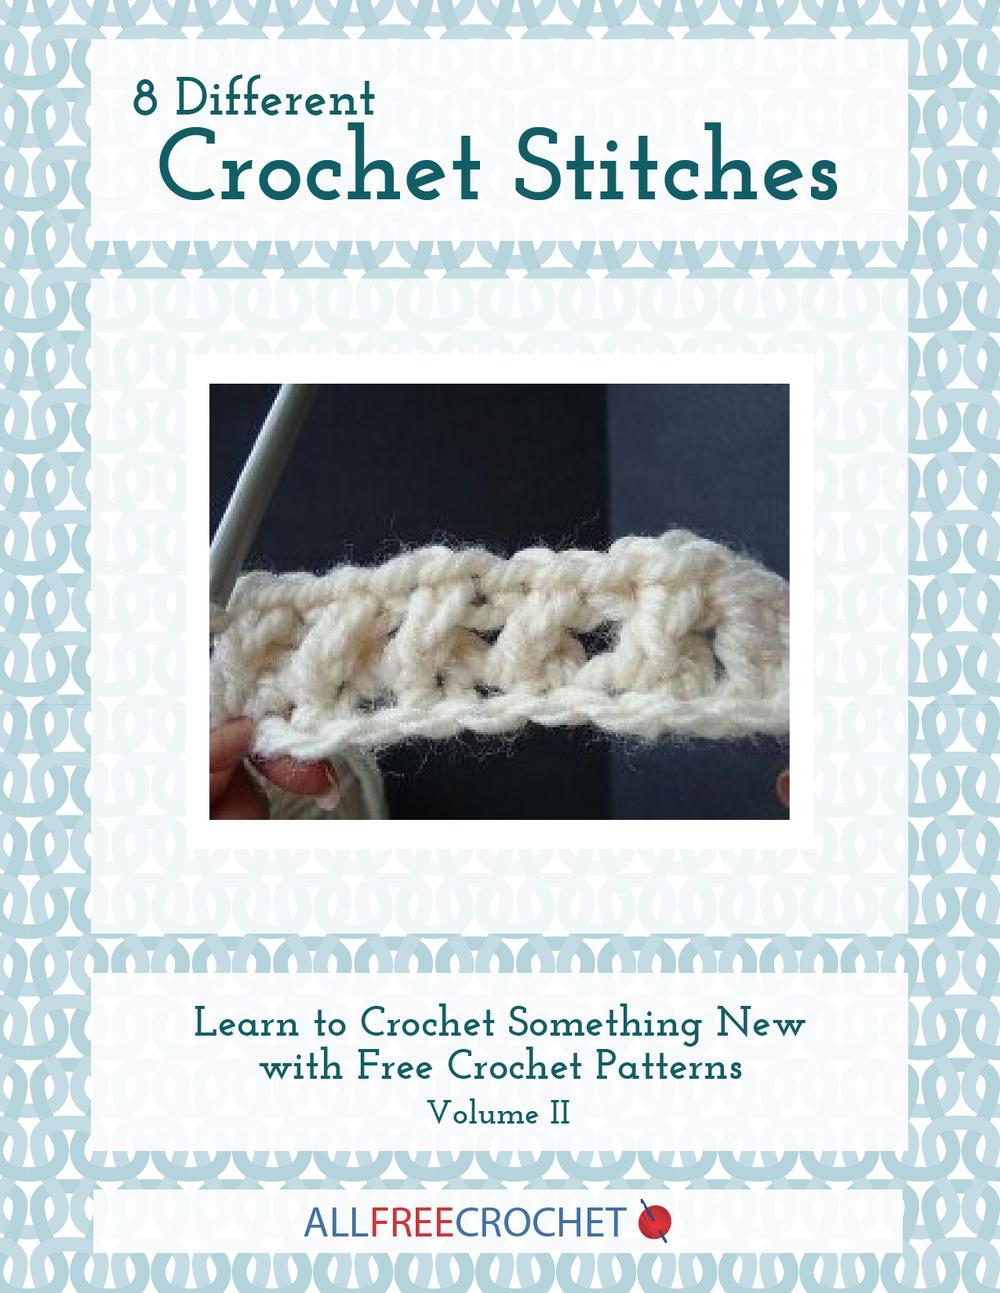 20 Basic Crochet Stitches Diagram Patterns 8 Different Volume Ii